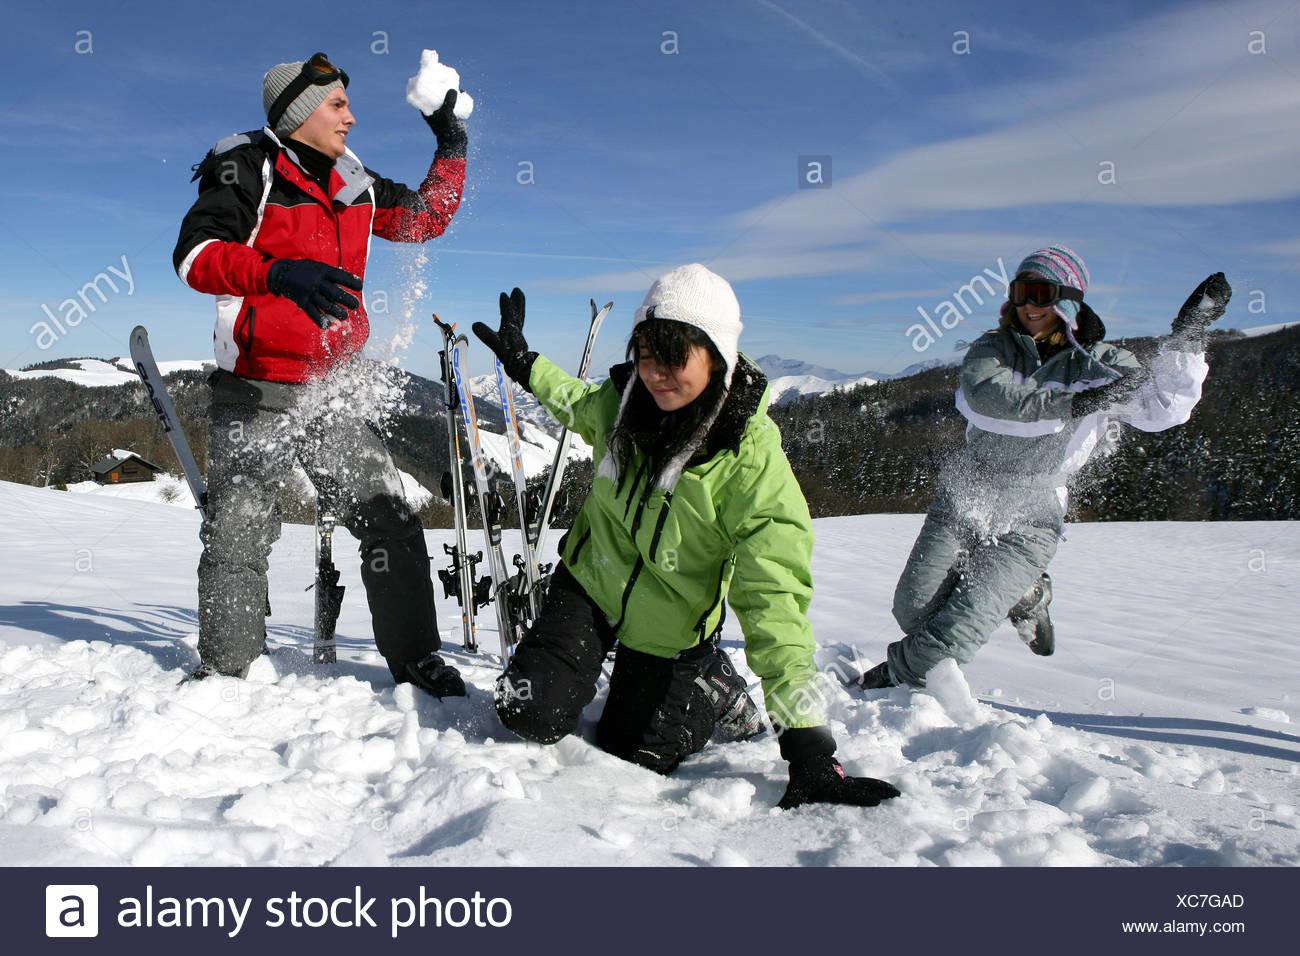 profile woman women friendship ski skiing snowball fight young younger enthusiasm amusement enjoyment joy gag joke pleasure fun - Stock Image